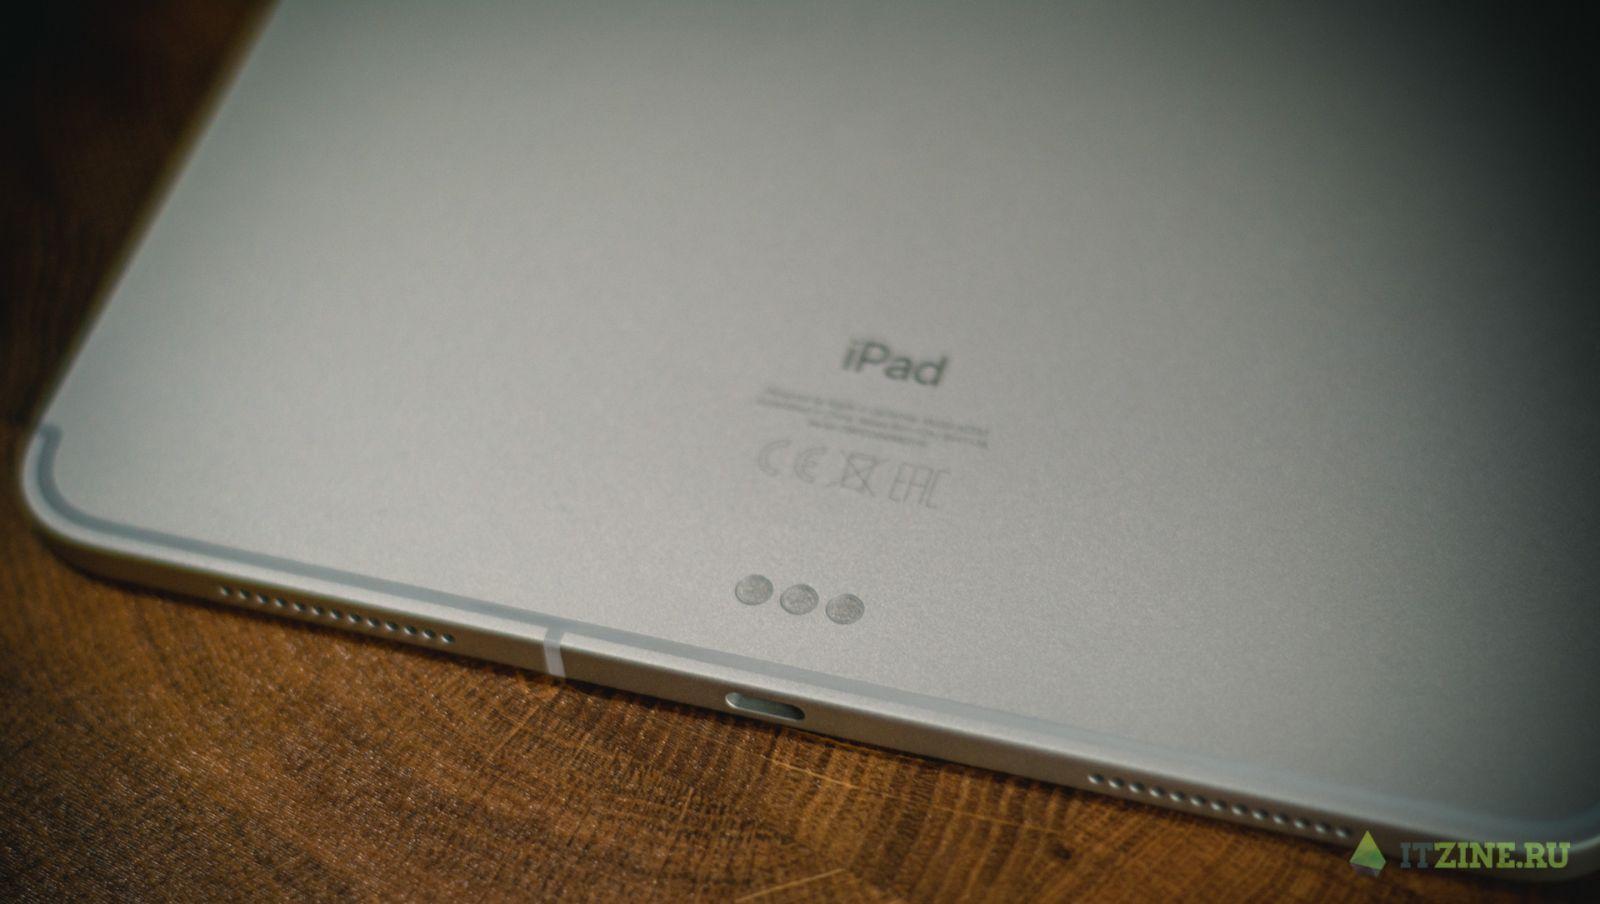 Дизайнерский рай. Обзор Apple iPad Pro 2020 + Apple Pencil + Magic Keyboard (dsc 8905)